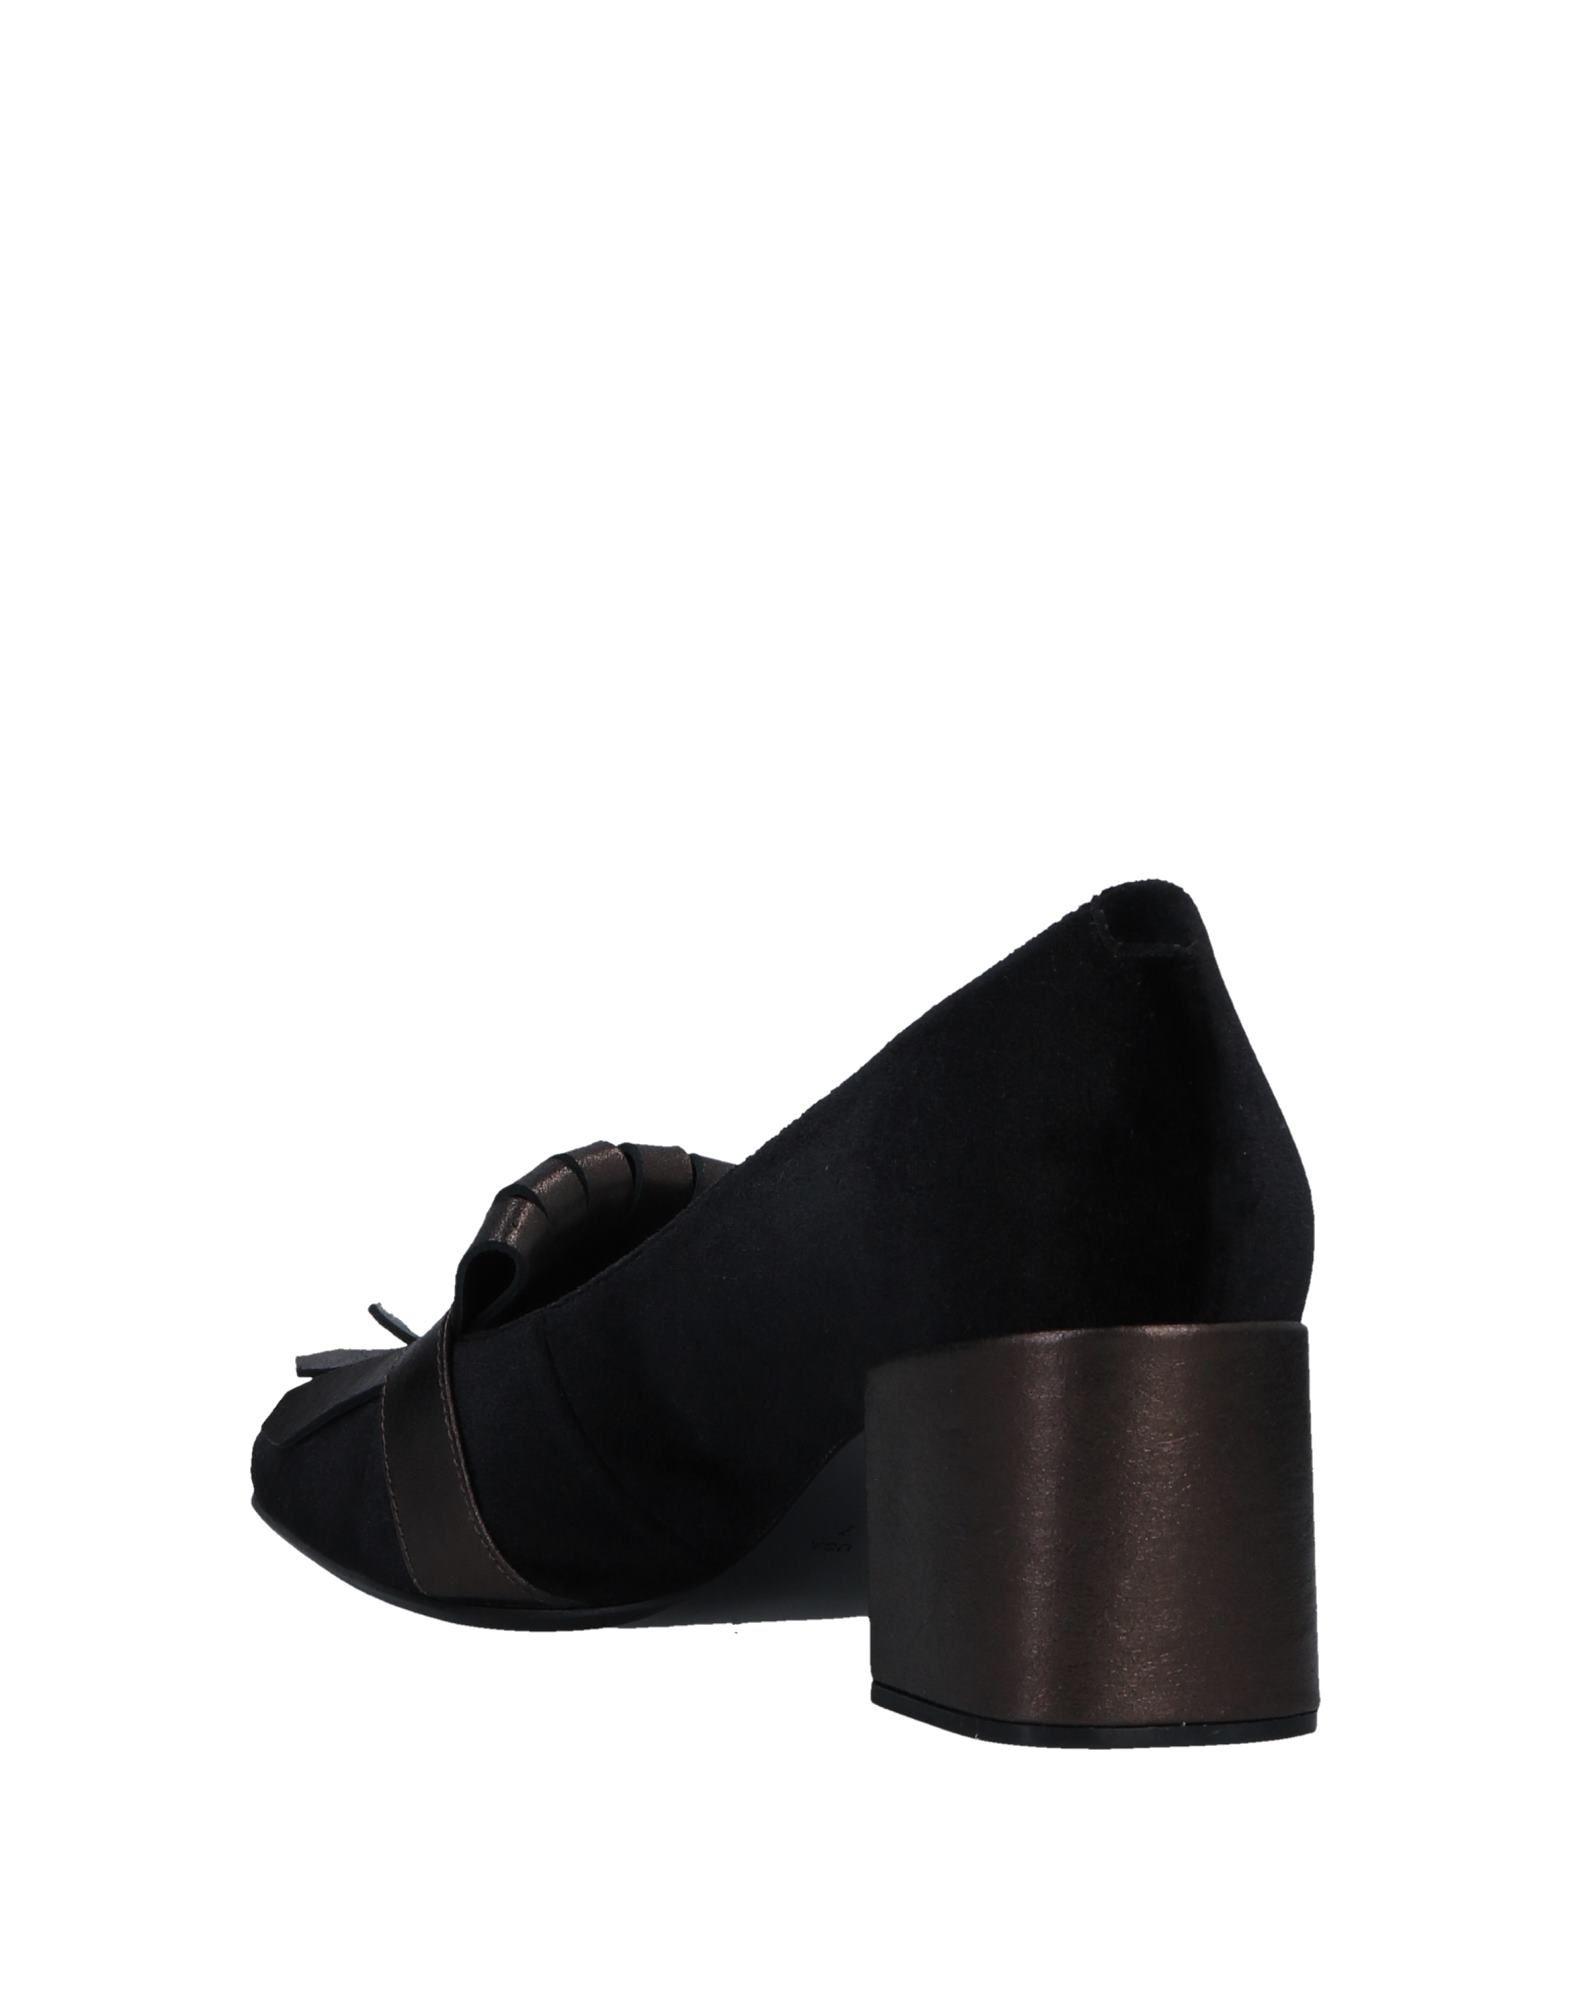 Primafila Mokassins Qualität Damen  11520522KQ Gute Qualität Mokassins beliebte Schuhe 16ff8b